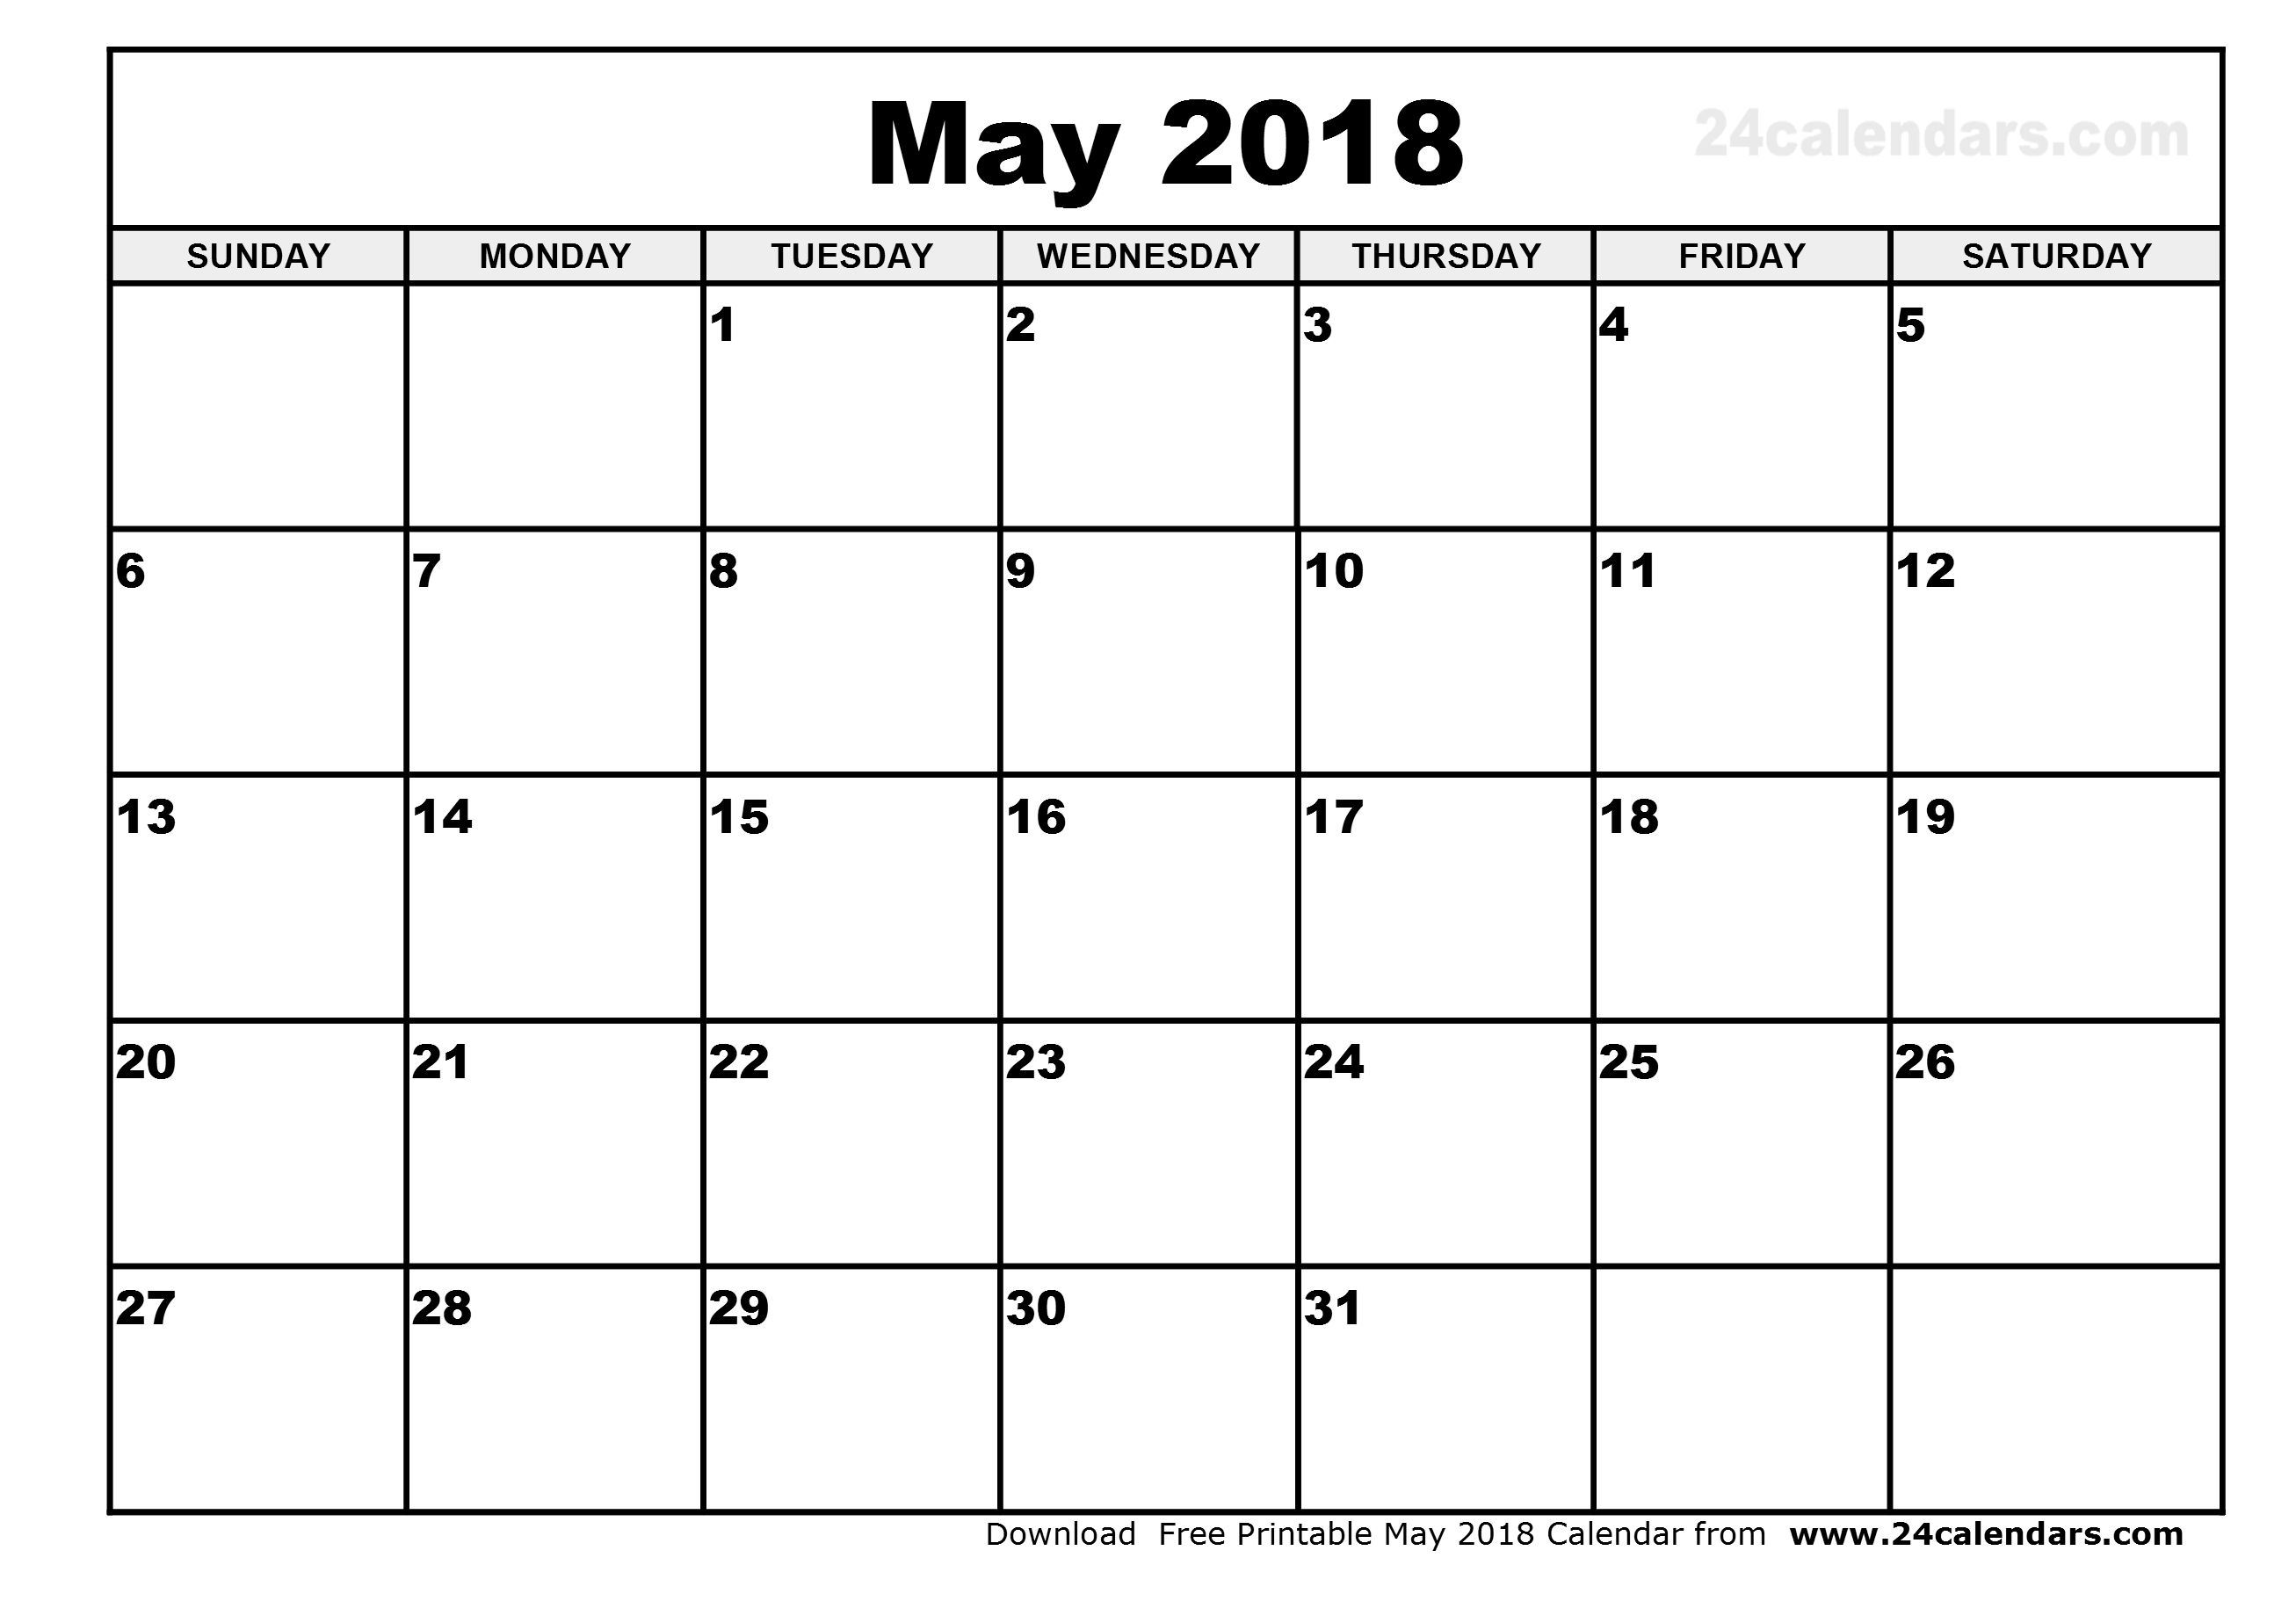 May 2018 Calendar PDF